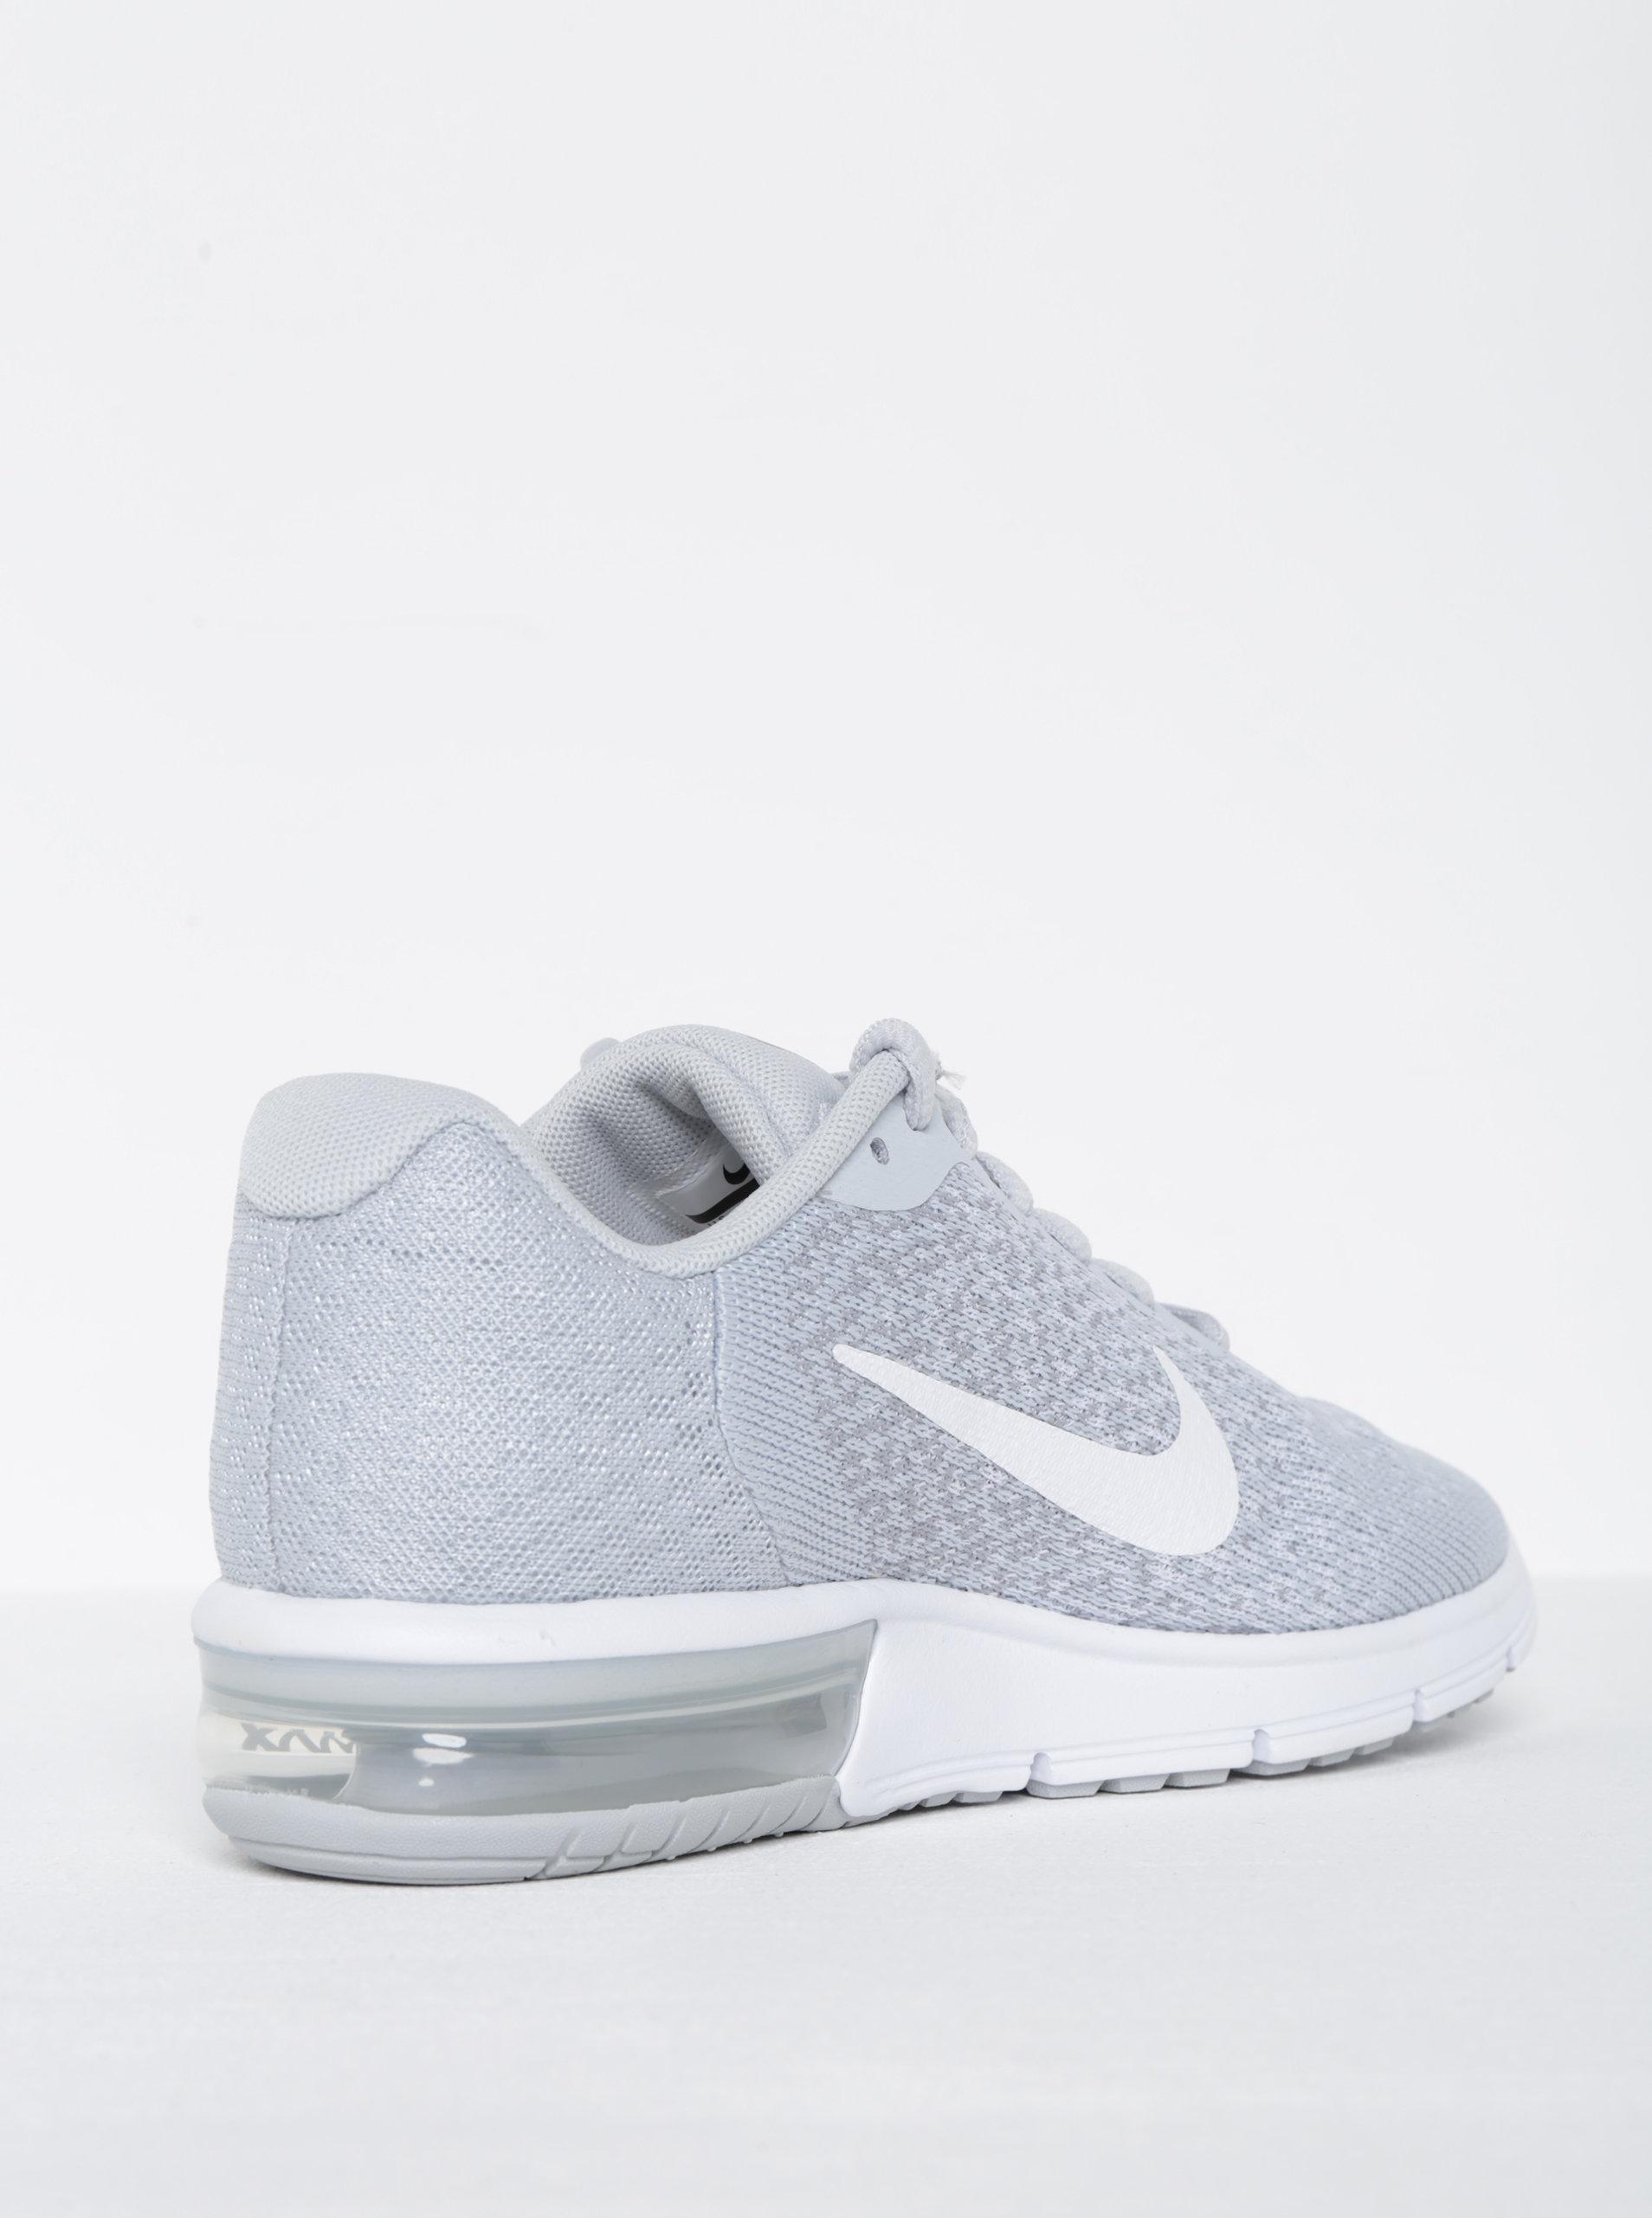 Světle šedé žíhané dámské tenisky Nike Air Max Sequent ... 9d8c746c6c